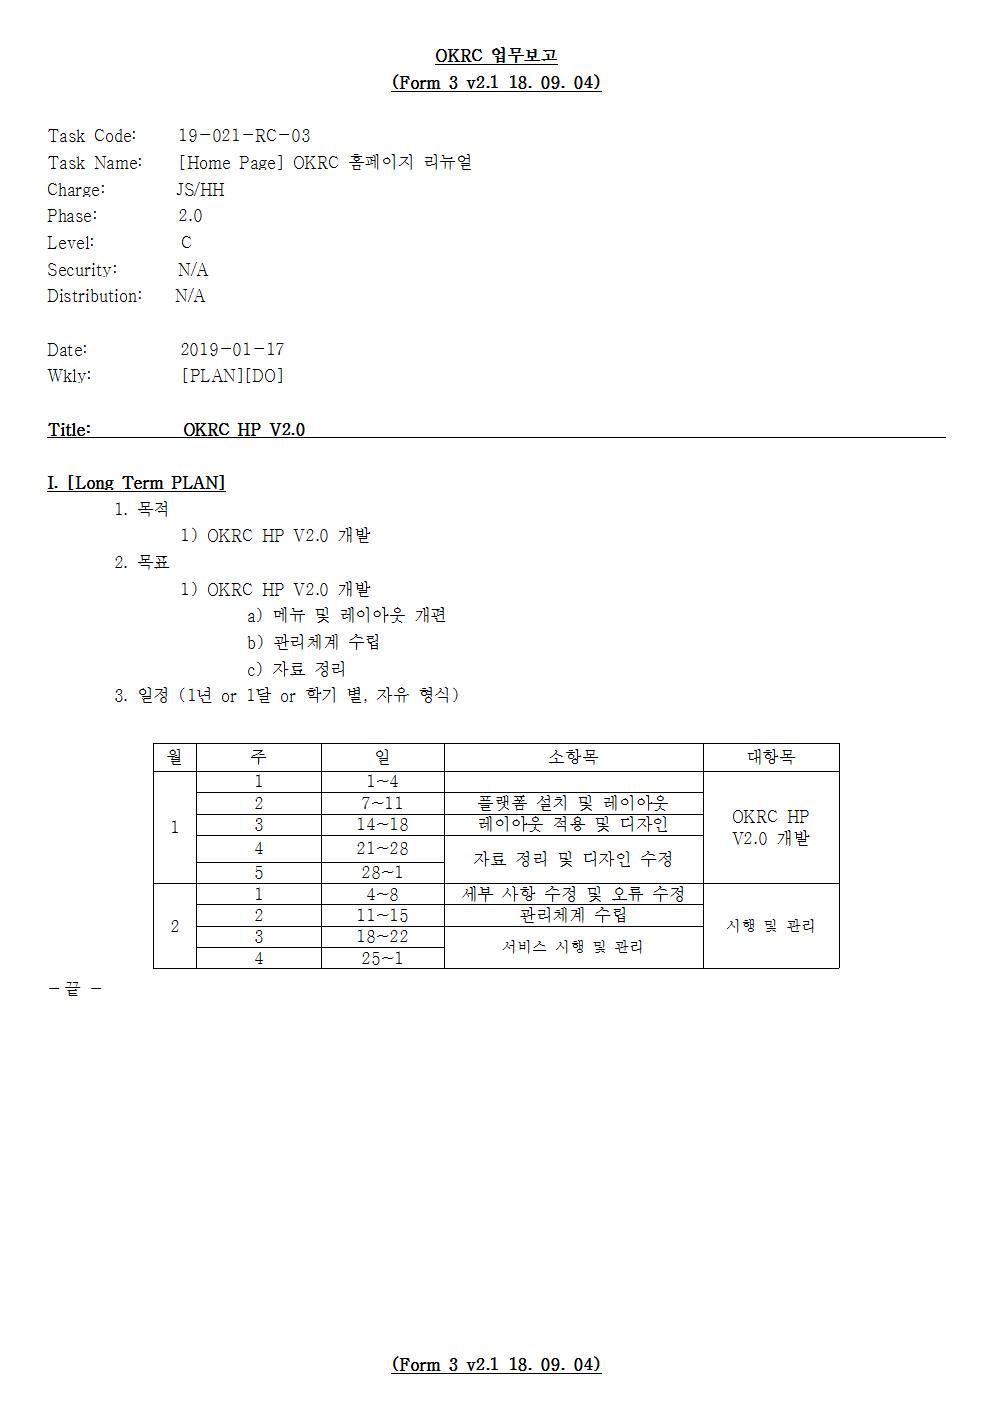 D-[19-021-RC-03]-[OKRCHP V2.0]-[2019-01-17][HH]001.jpg